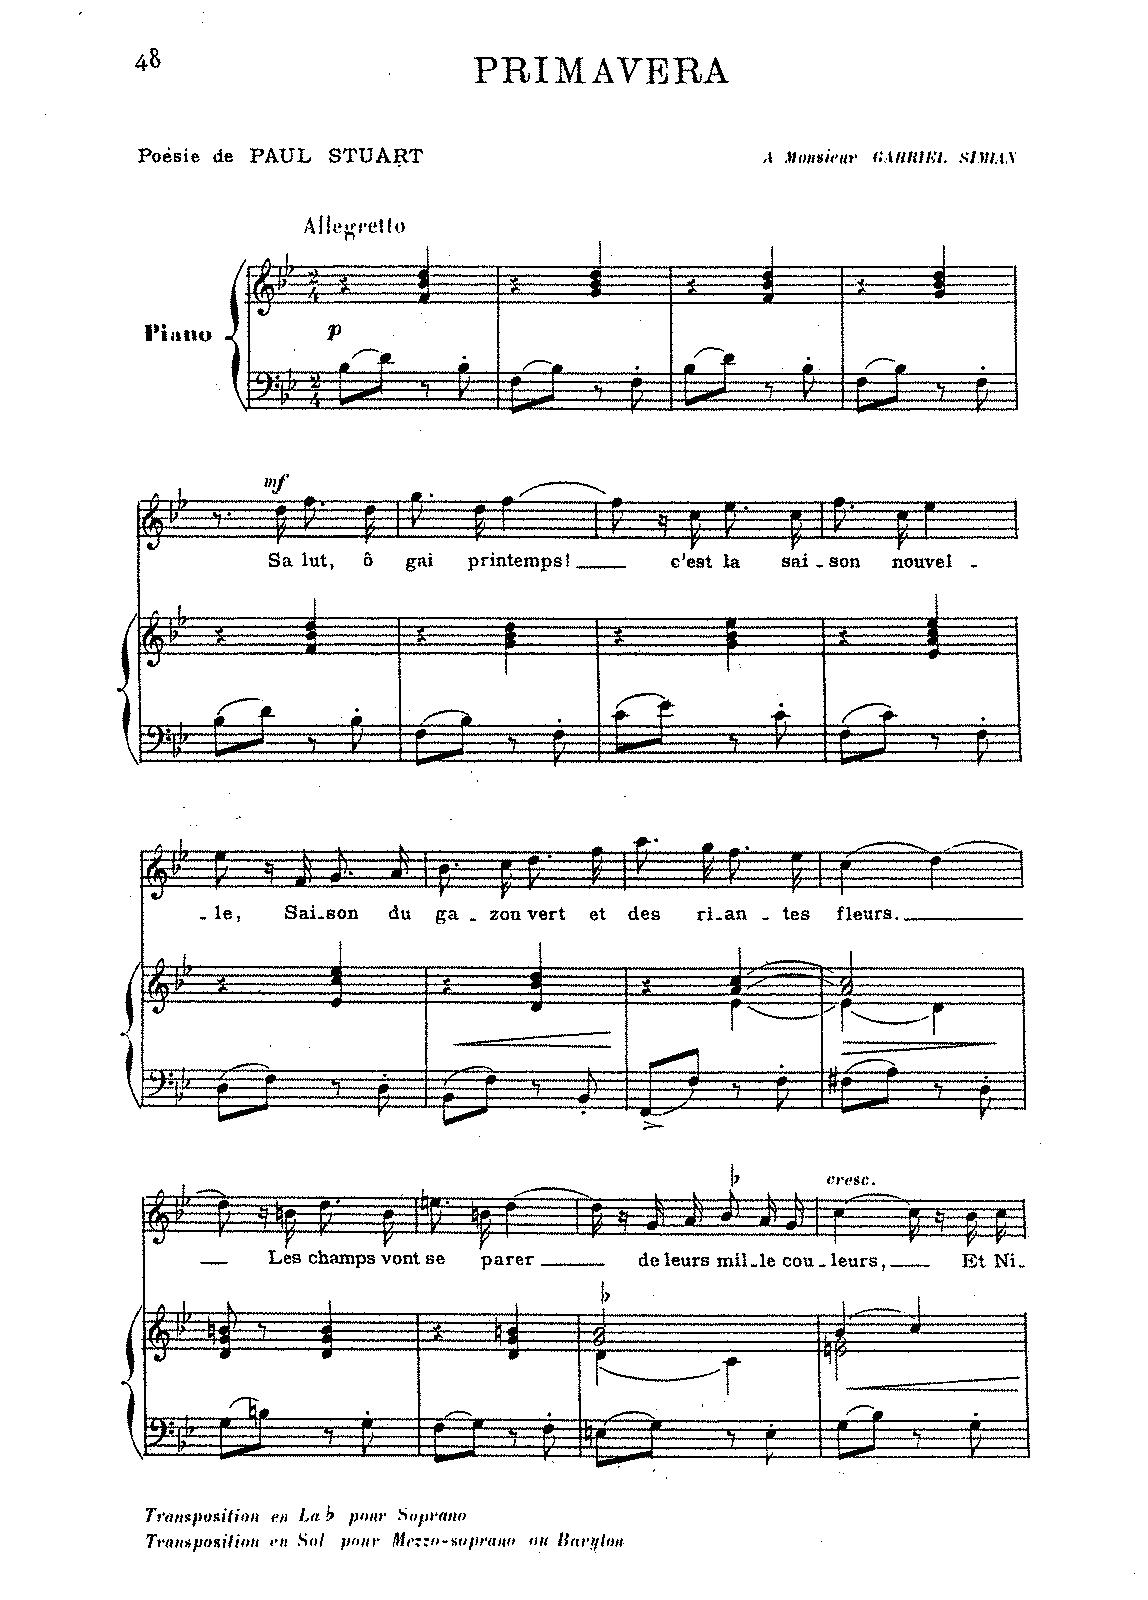 Primavera (Saint-Saëns, Camille) - IMSLP/Petrucci Music Library